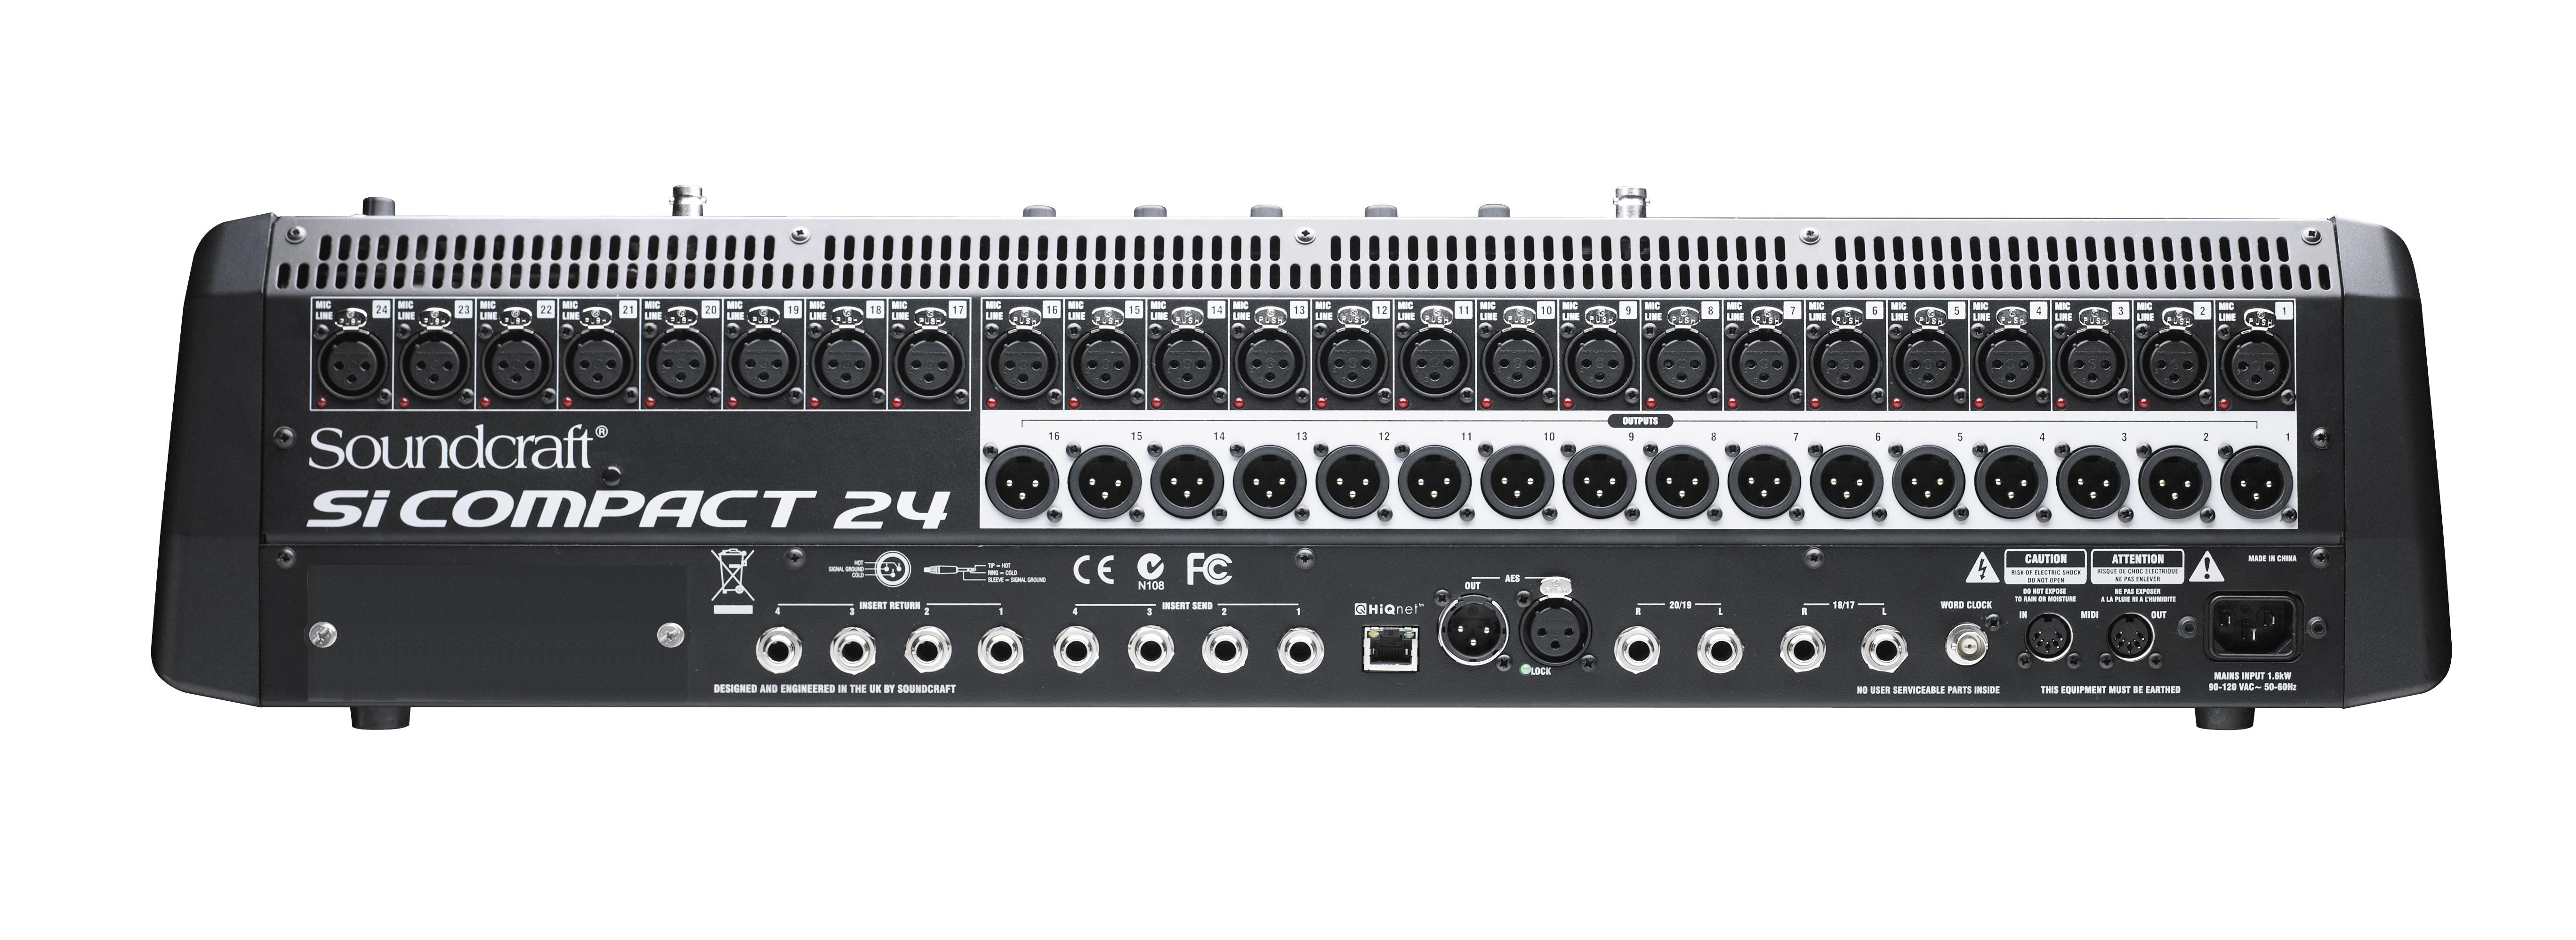 soundcraft si impact 24 manual